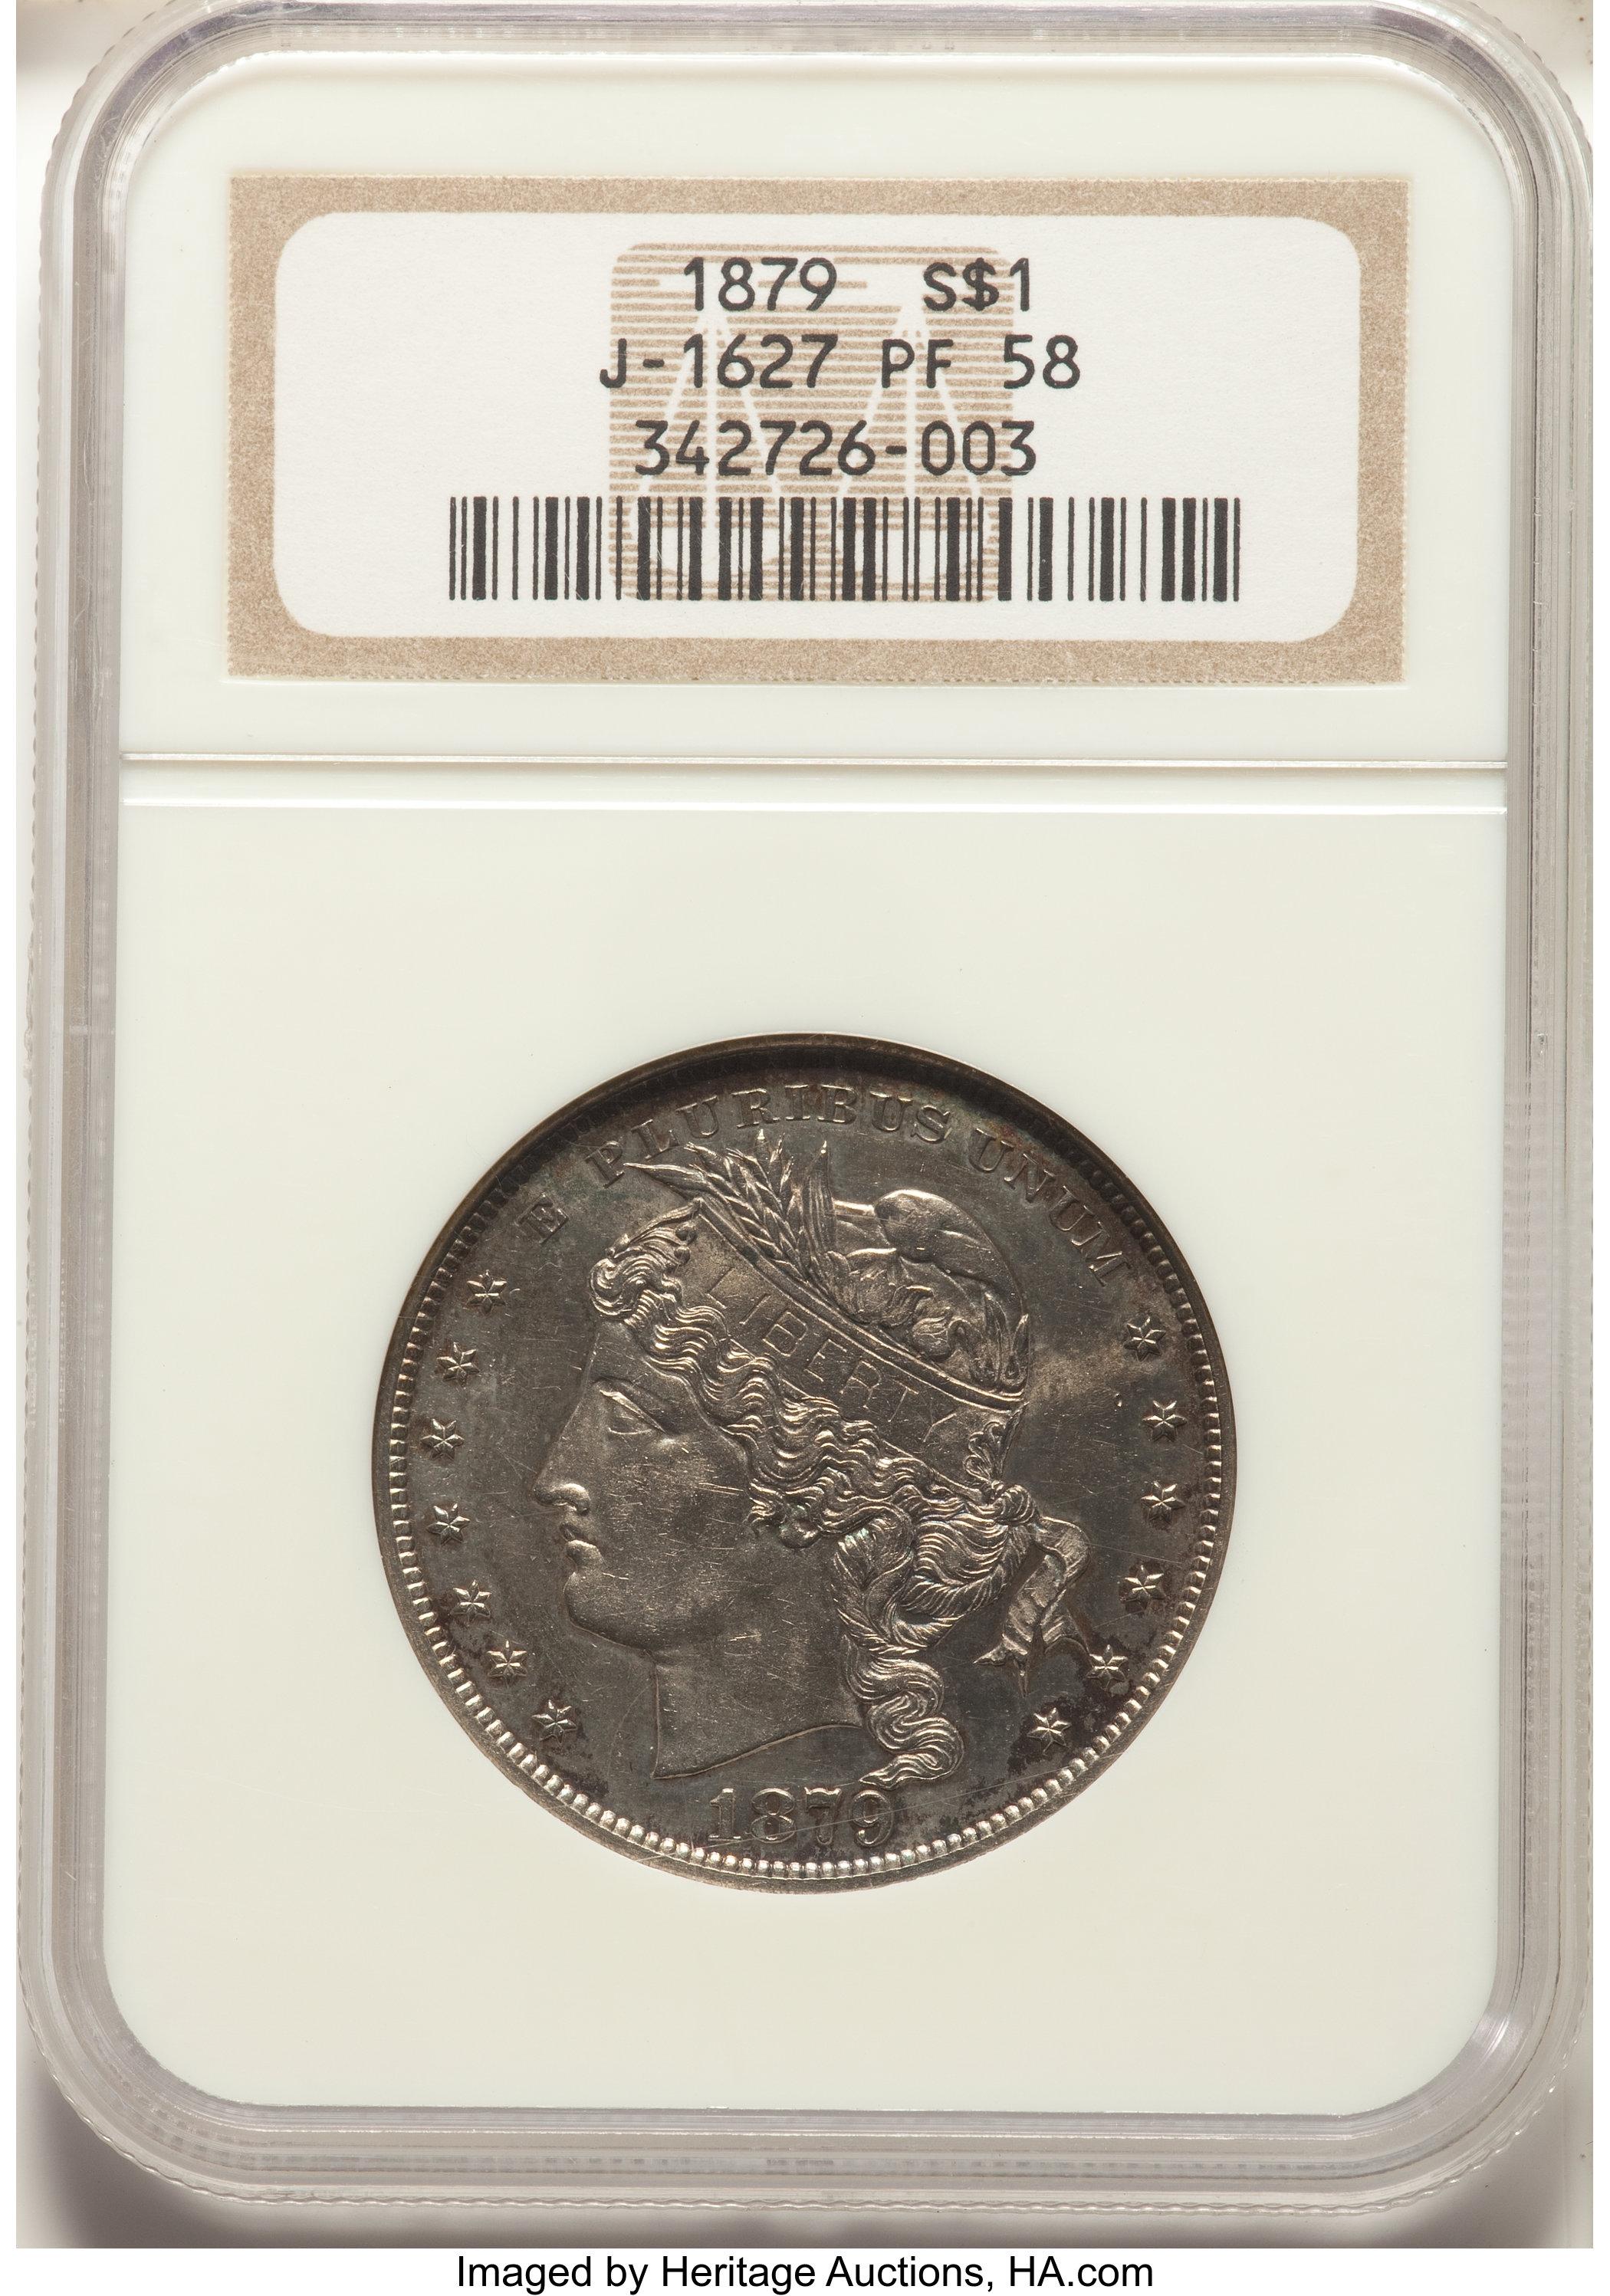 sample image for 1879 J-1627 P$1 PR